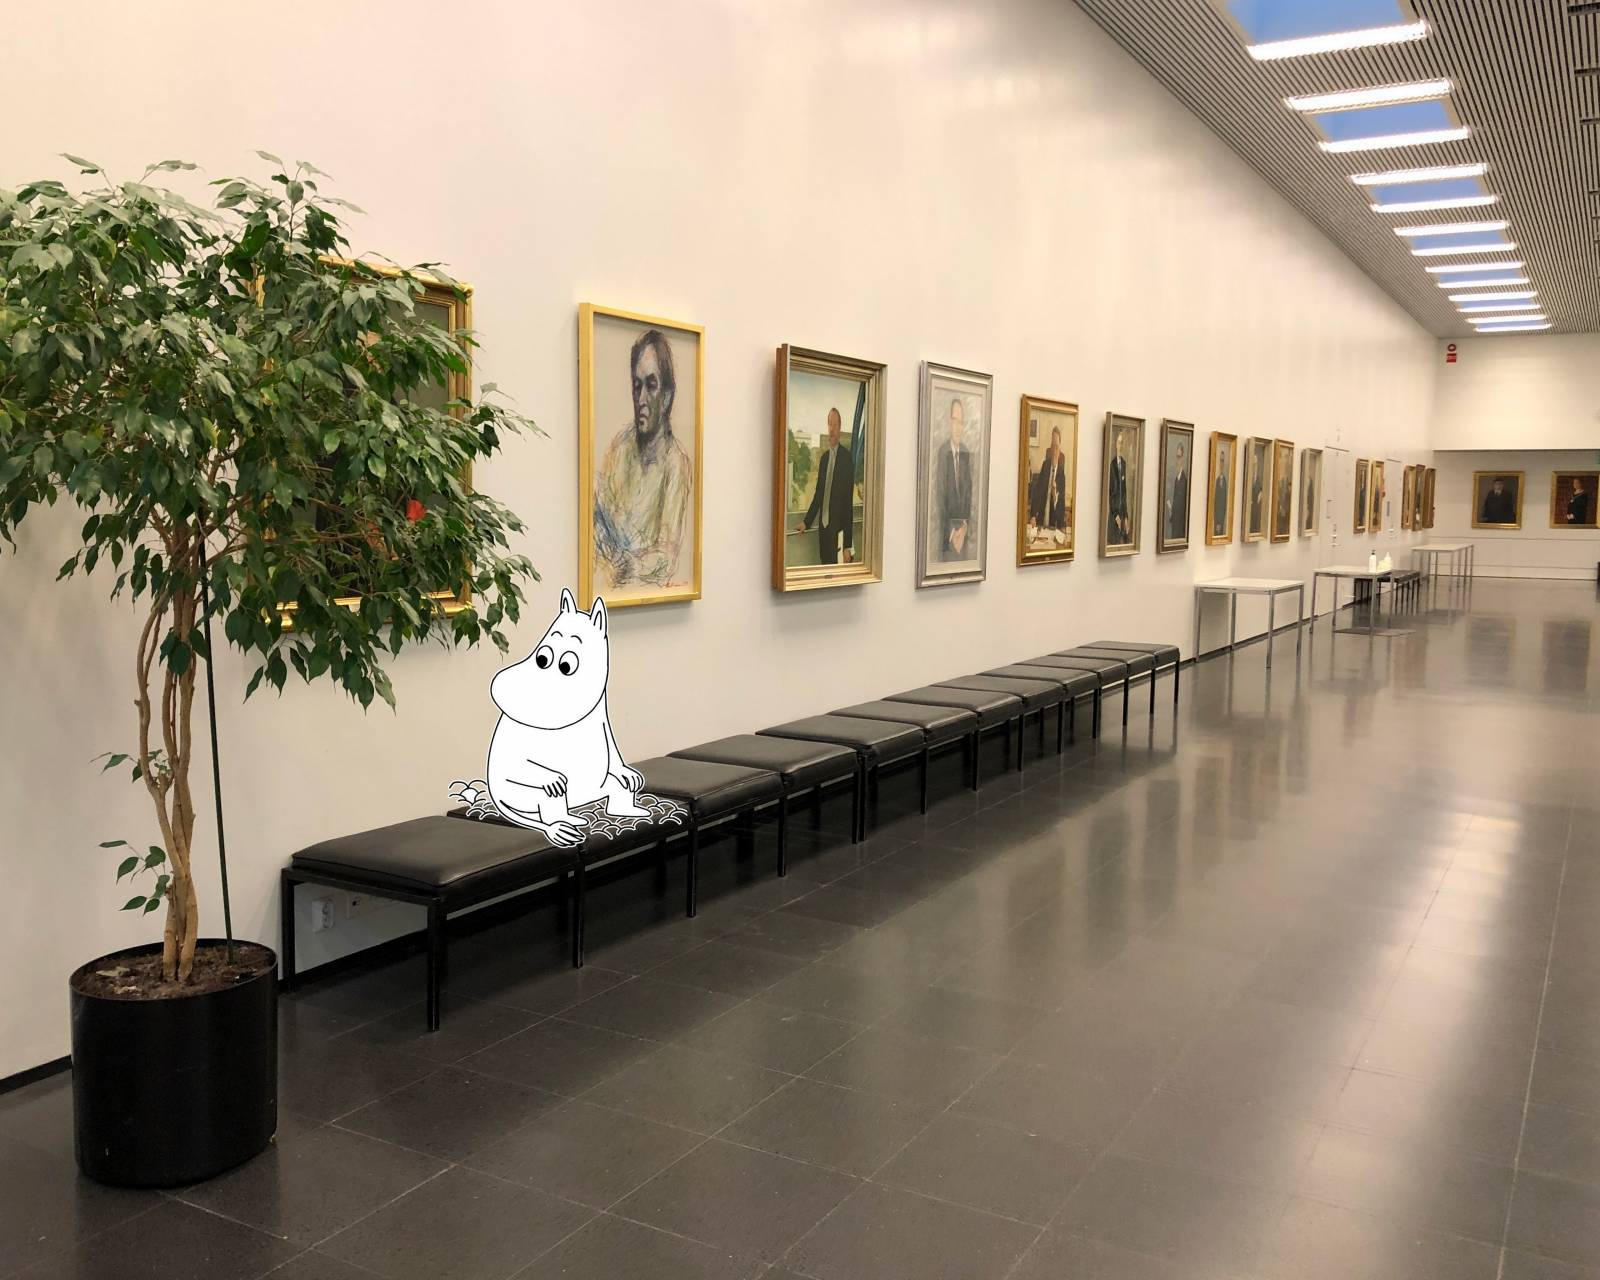 Moomintroll sitting in university lobby.